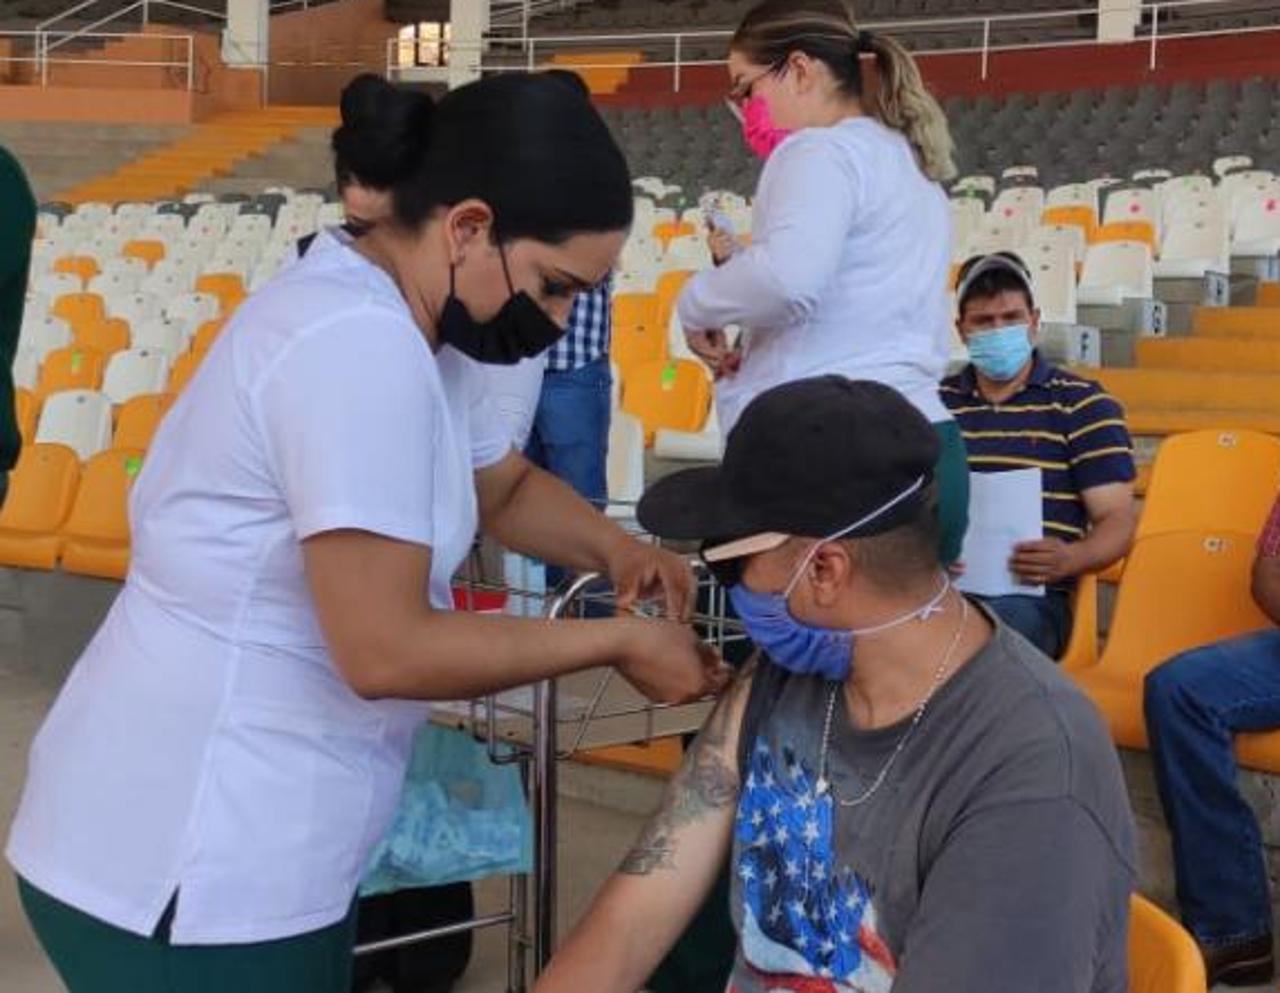 ¡Va el piquete! Toca segunda dosis a los de 18 a 29 en Querétaro capital